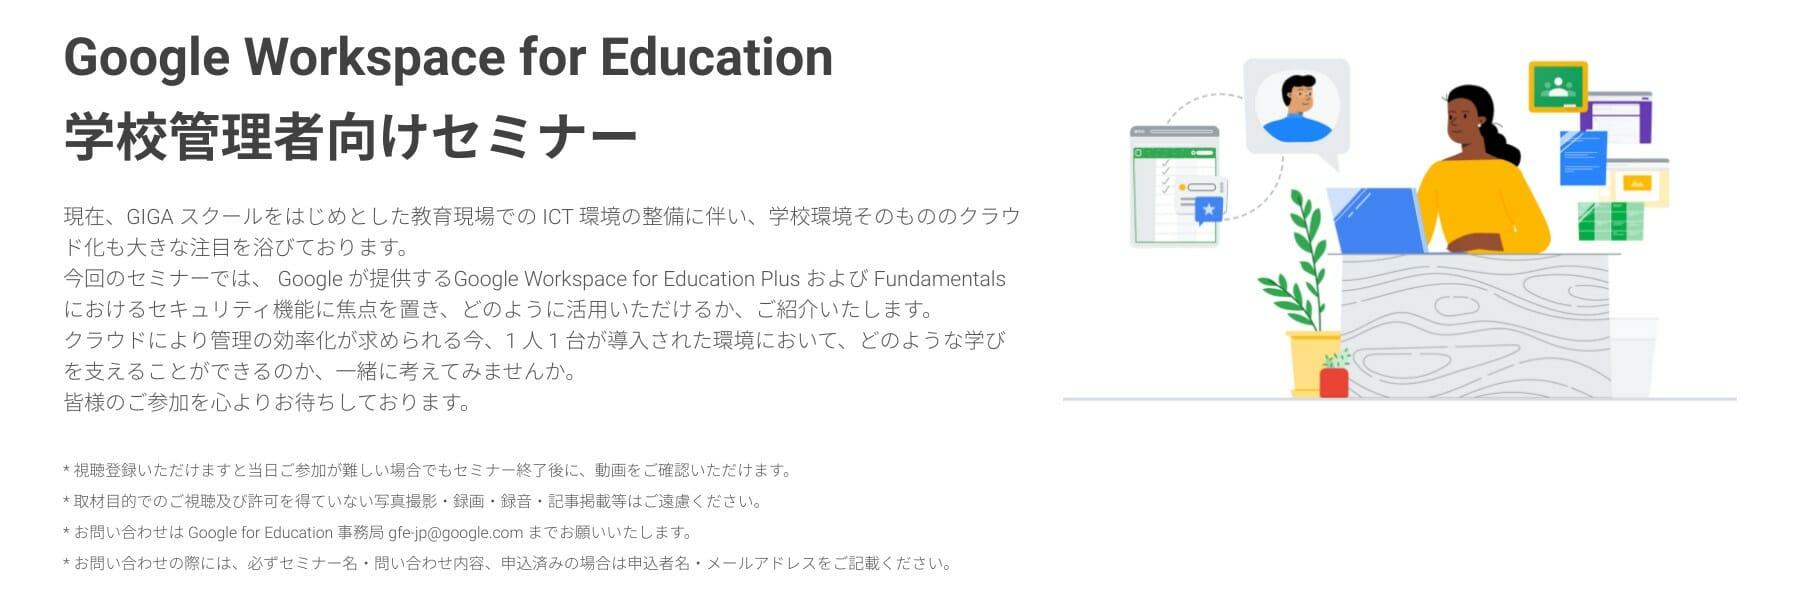 [Google for Educatio] Google Workspace for Education 学校管理者向けセミナー